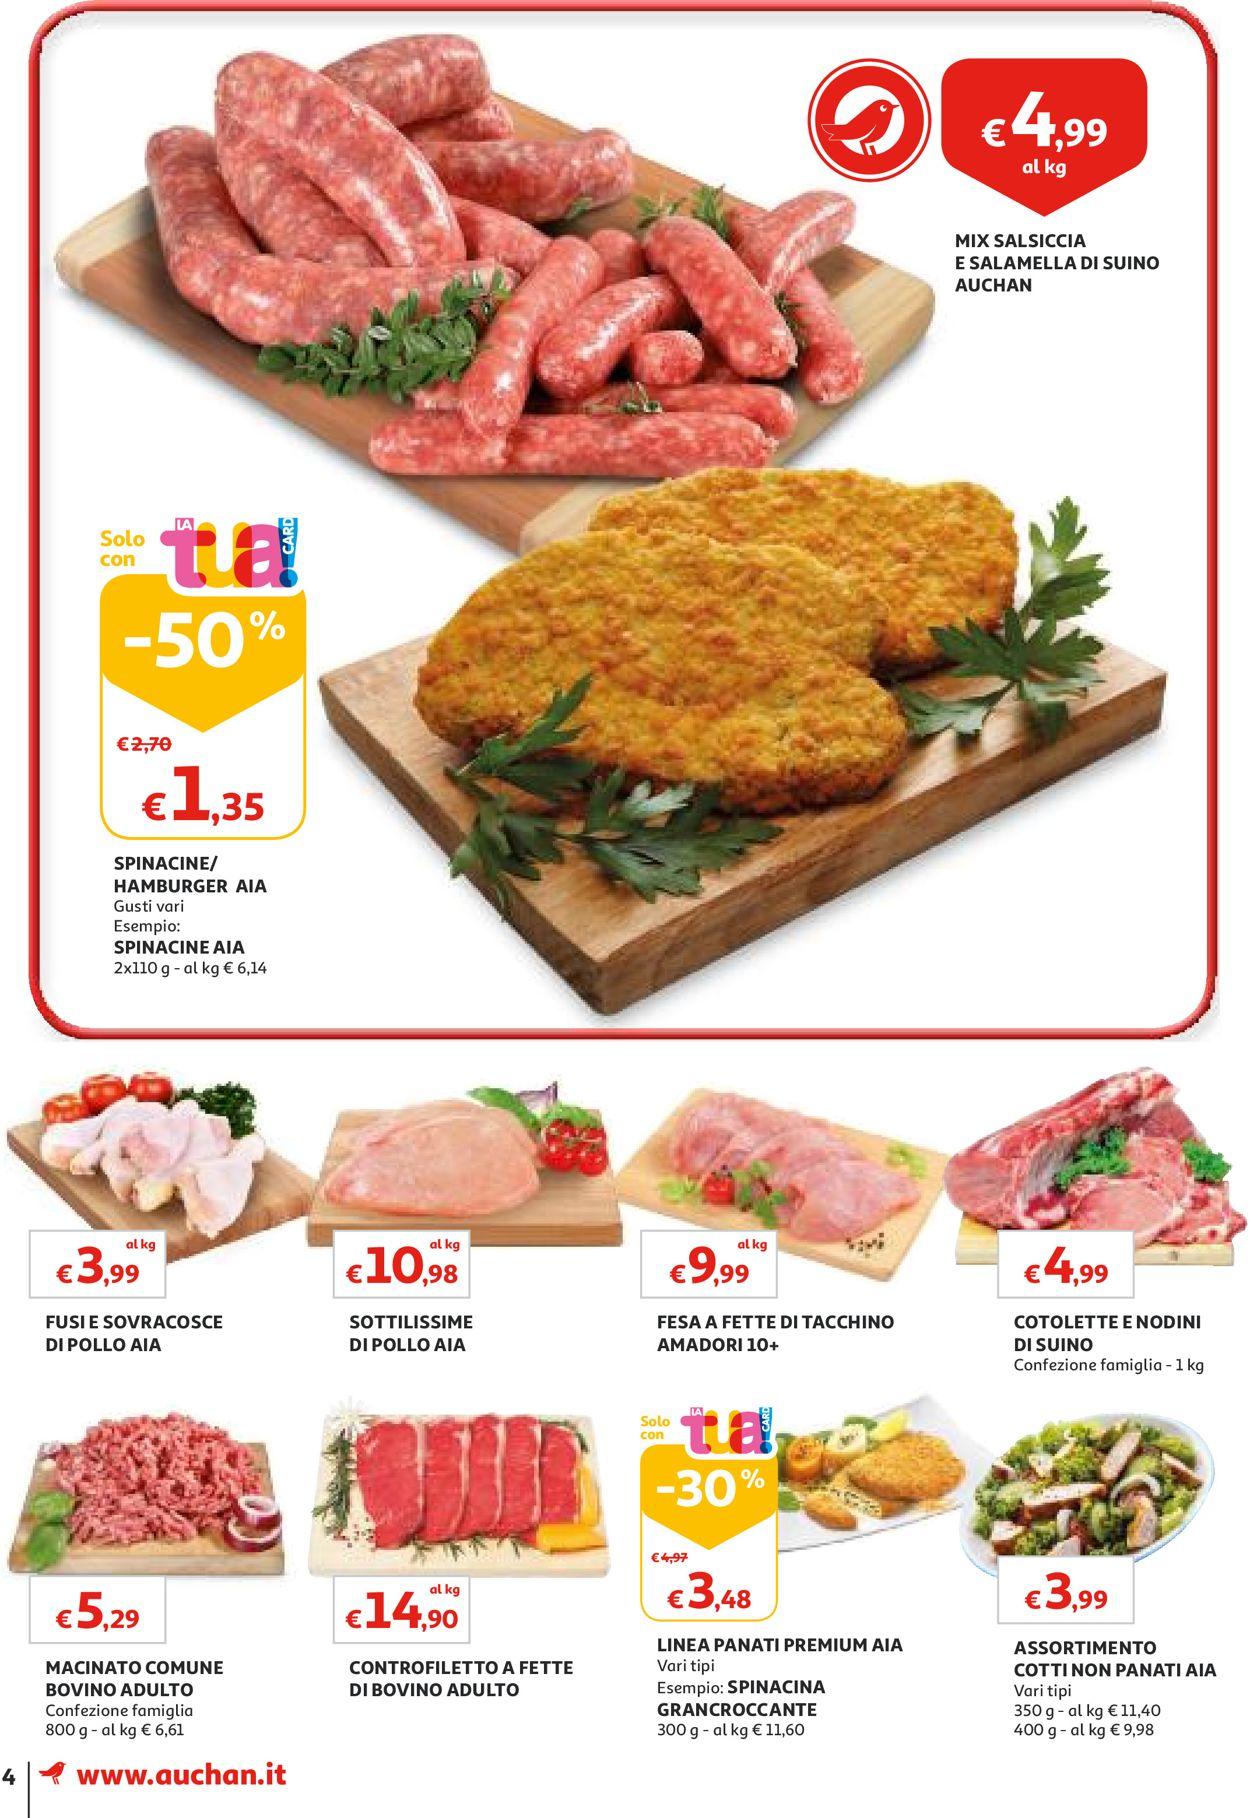 Volantino Auchan - Offerte 20/08-28/08/2019 (Pagina 4)